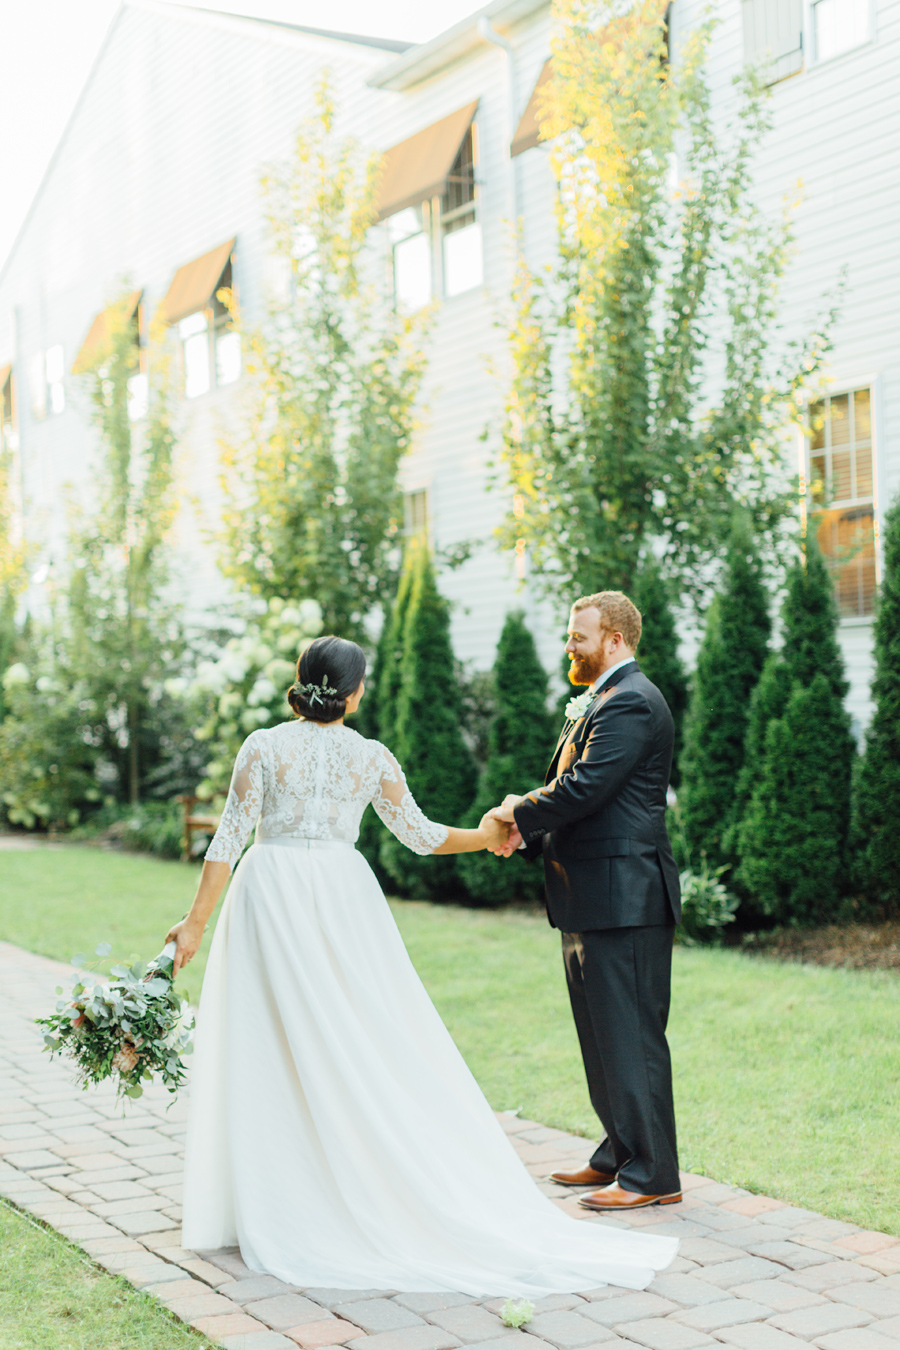 the-inn-at-leola-wedding-lancaster-pennsylvania-wedding-photographer-rebeka-viola-photograhy (90).jpg